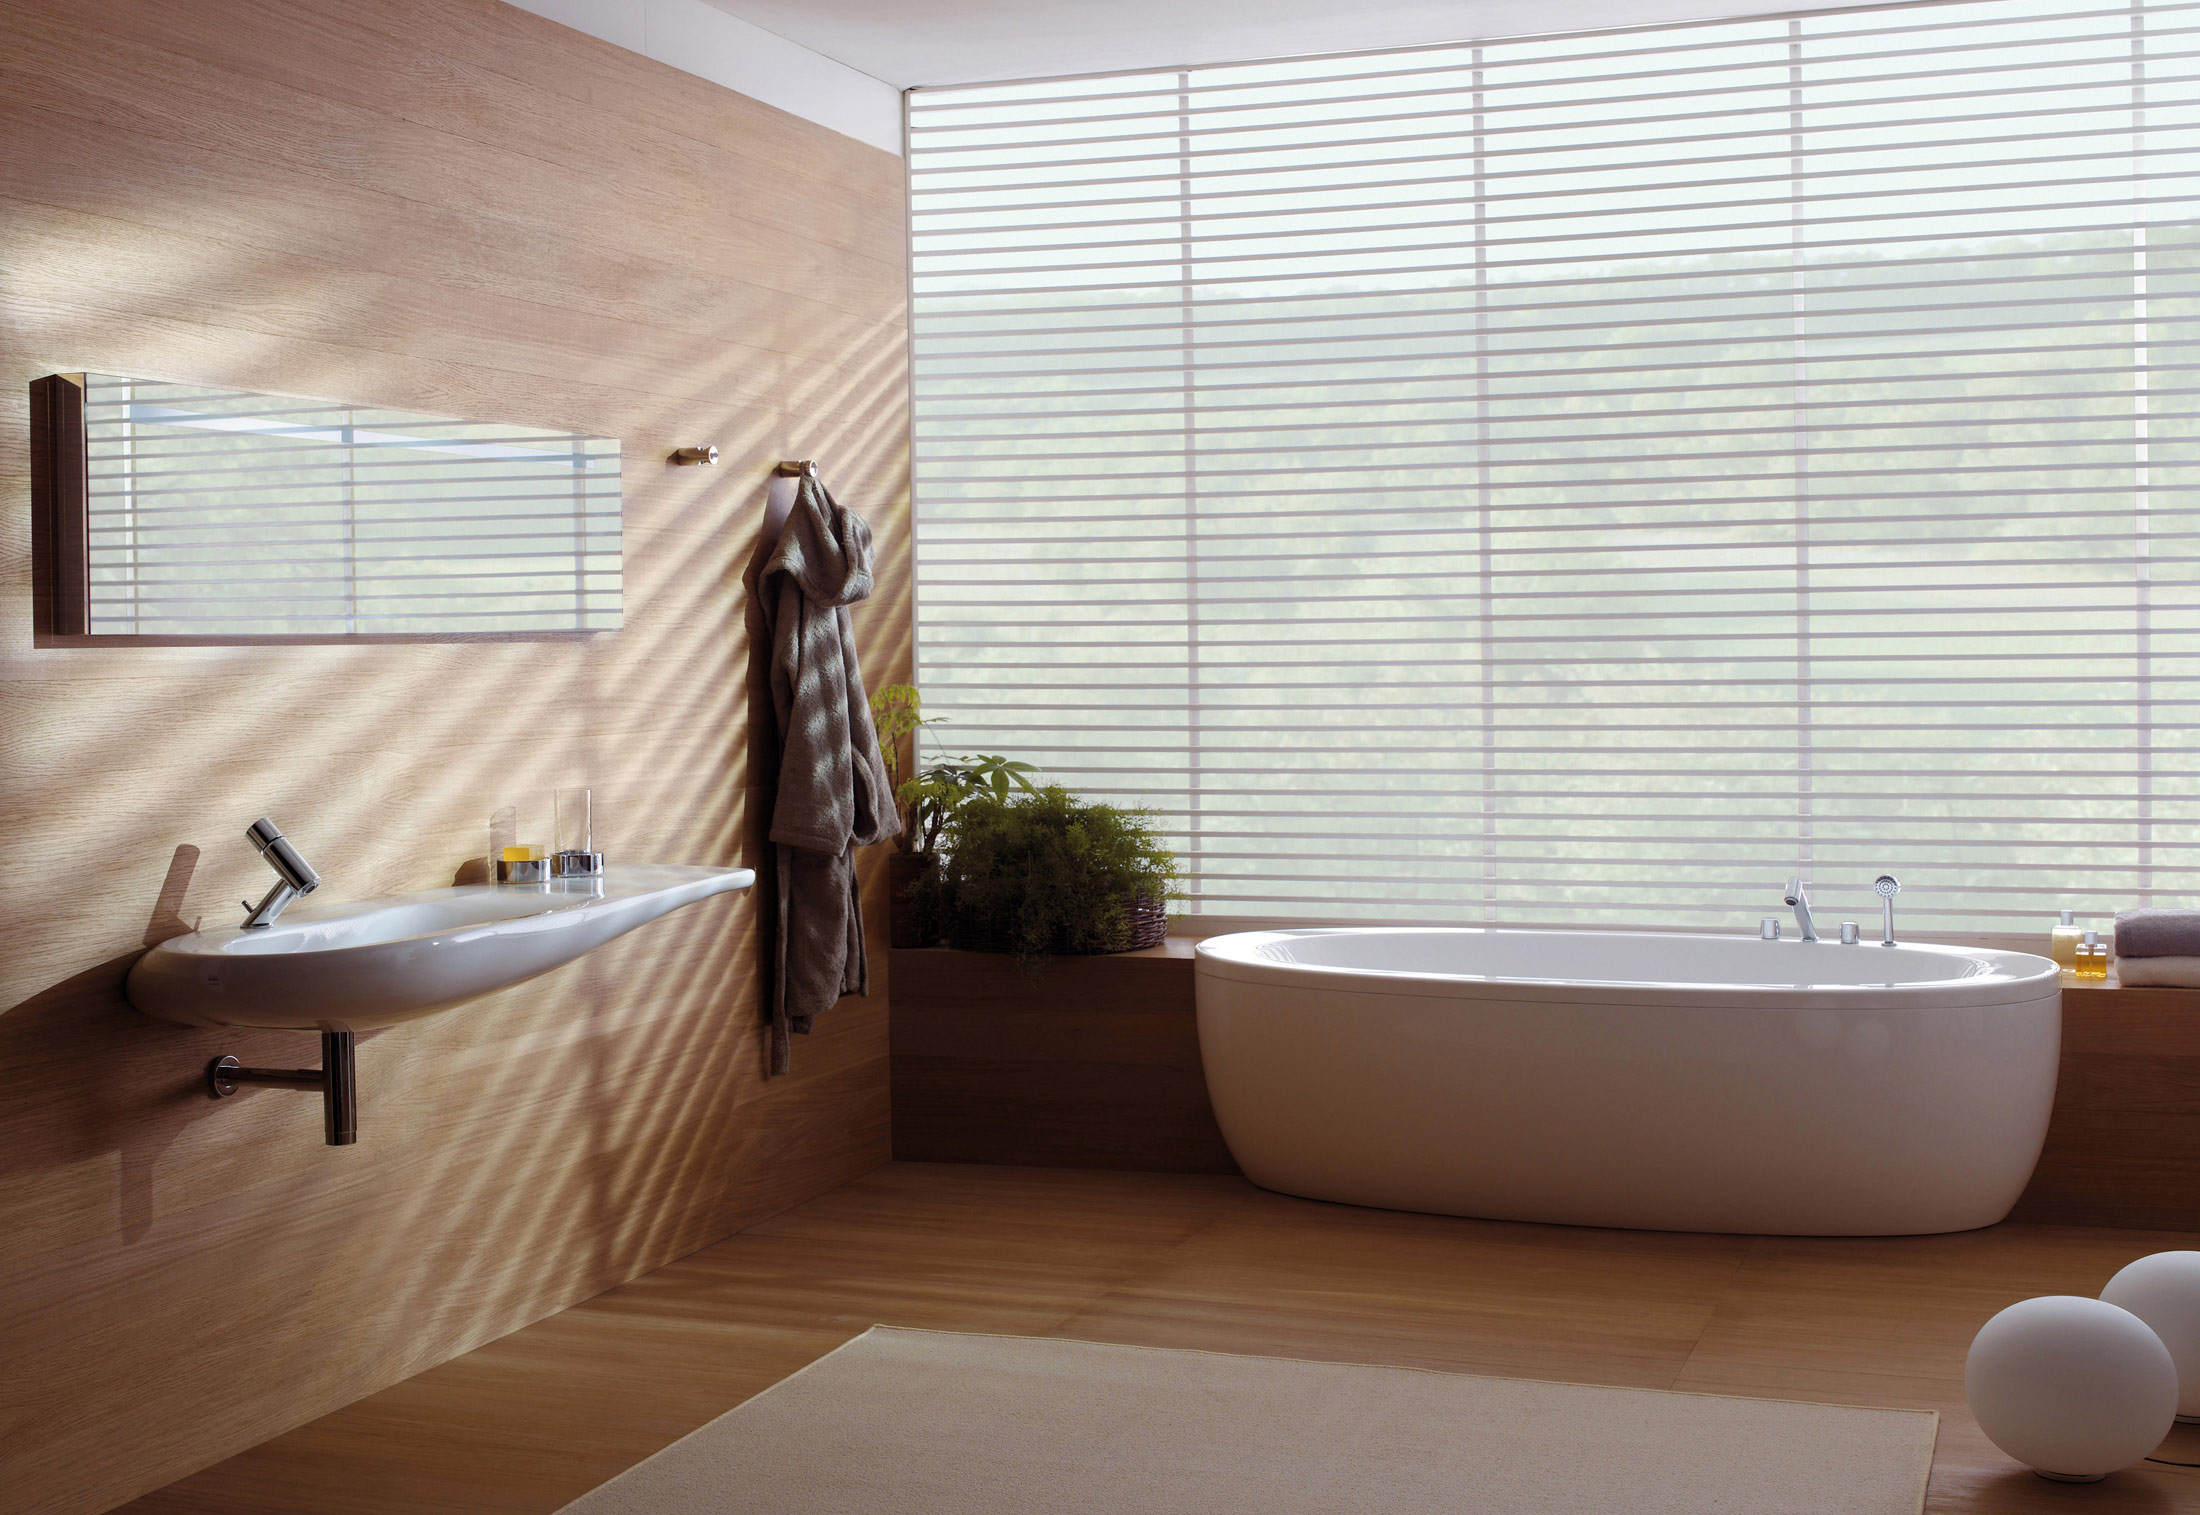 Il Bagno Alessi One bath tub by Laufen | STYLEPARK